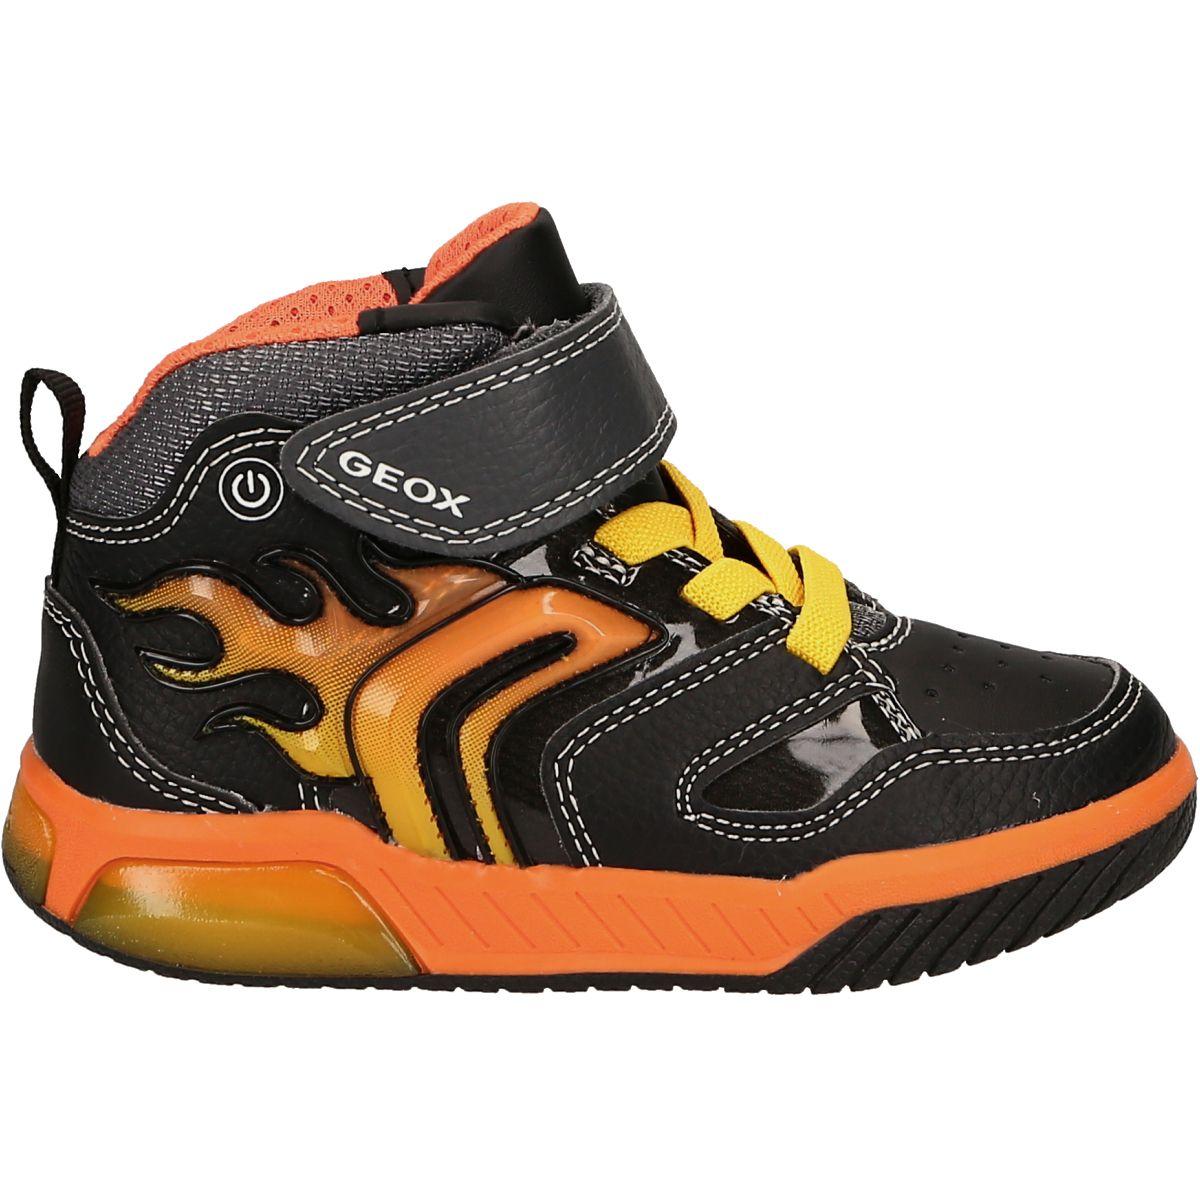 GEOX J949CC 0BU11 C0038 Children's shoes Slippers buy shoes